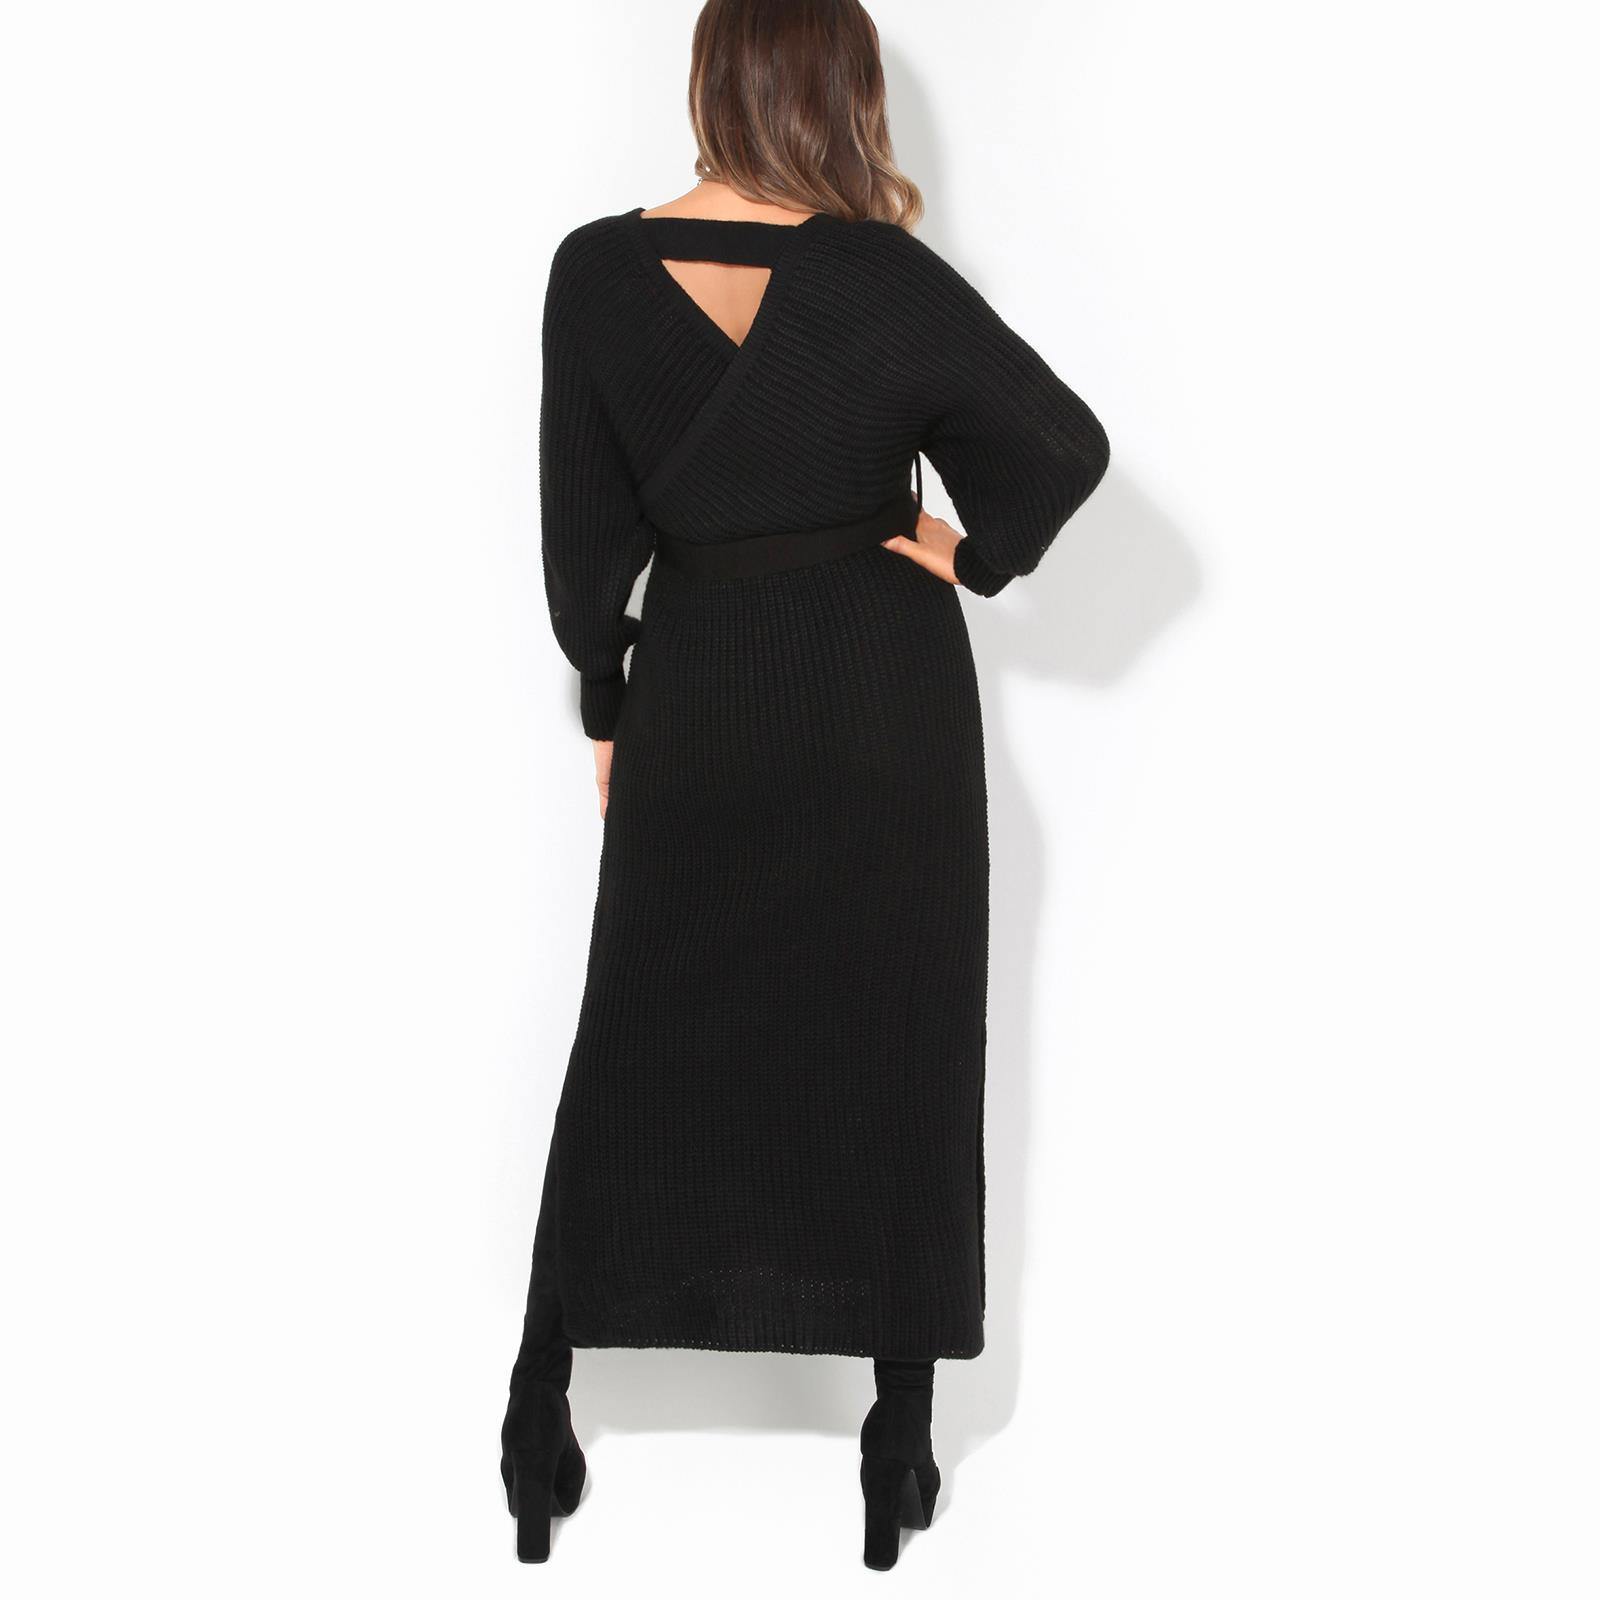 Womens-Ladies-Jumper-Dress-Chunky-Knit-Wrap-V-Neck-Maxi-Long-Sleeve-Winter-Top thumbnail 4